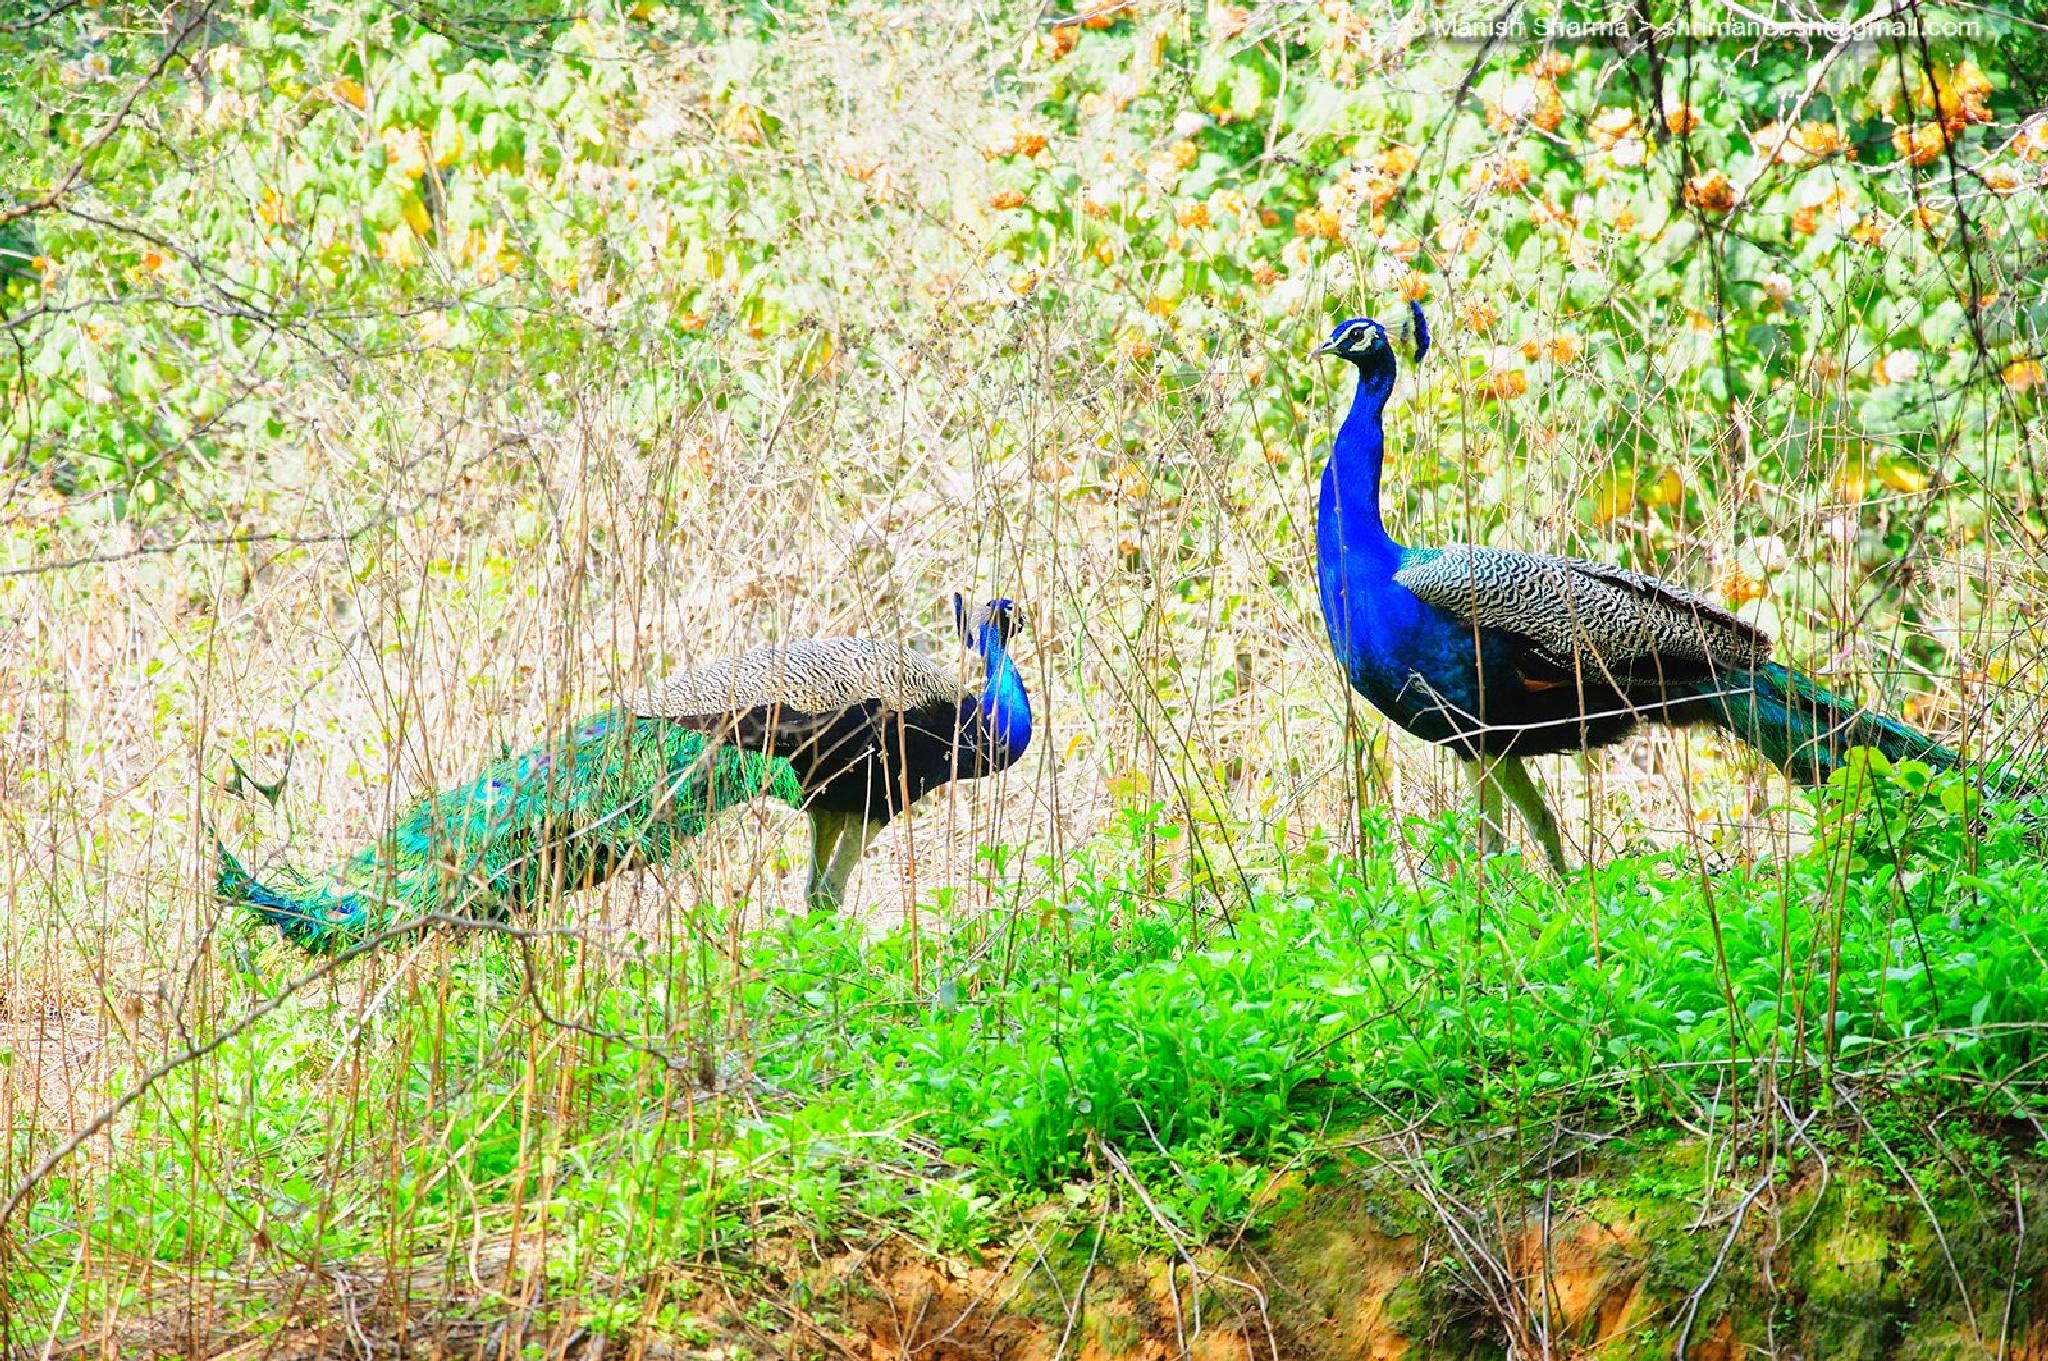 Peacock ..the Meeting of hearts by Maneesh Sharma